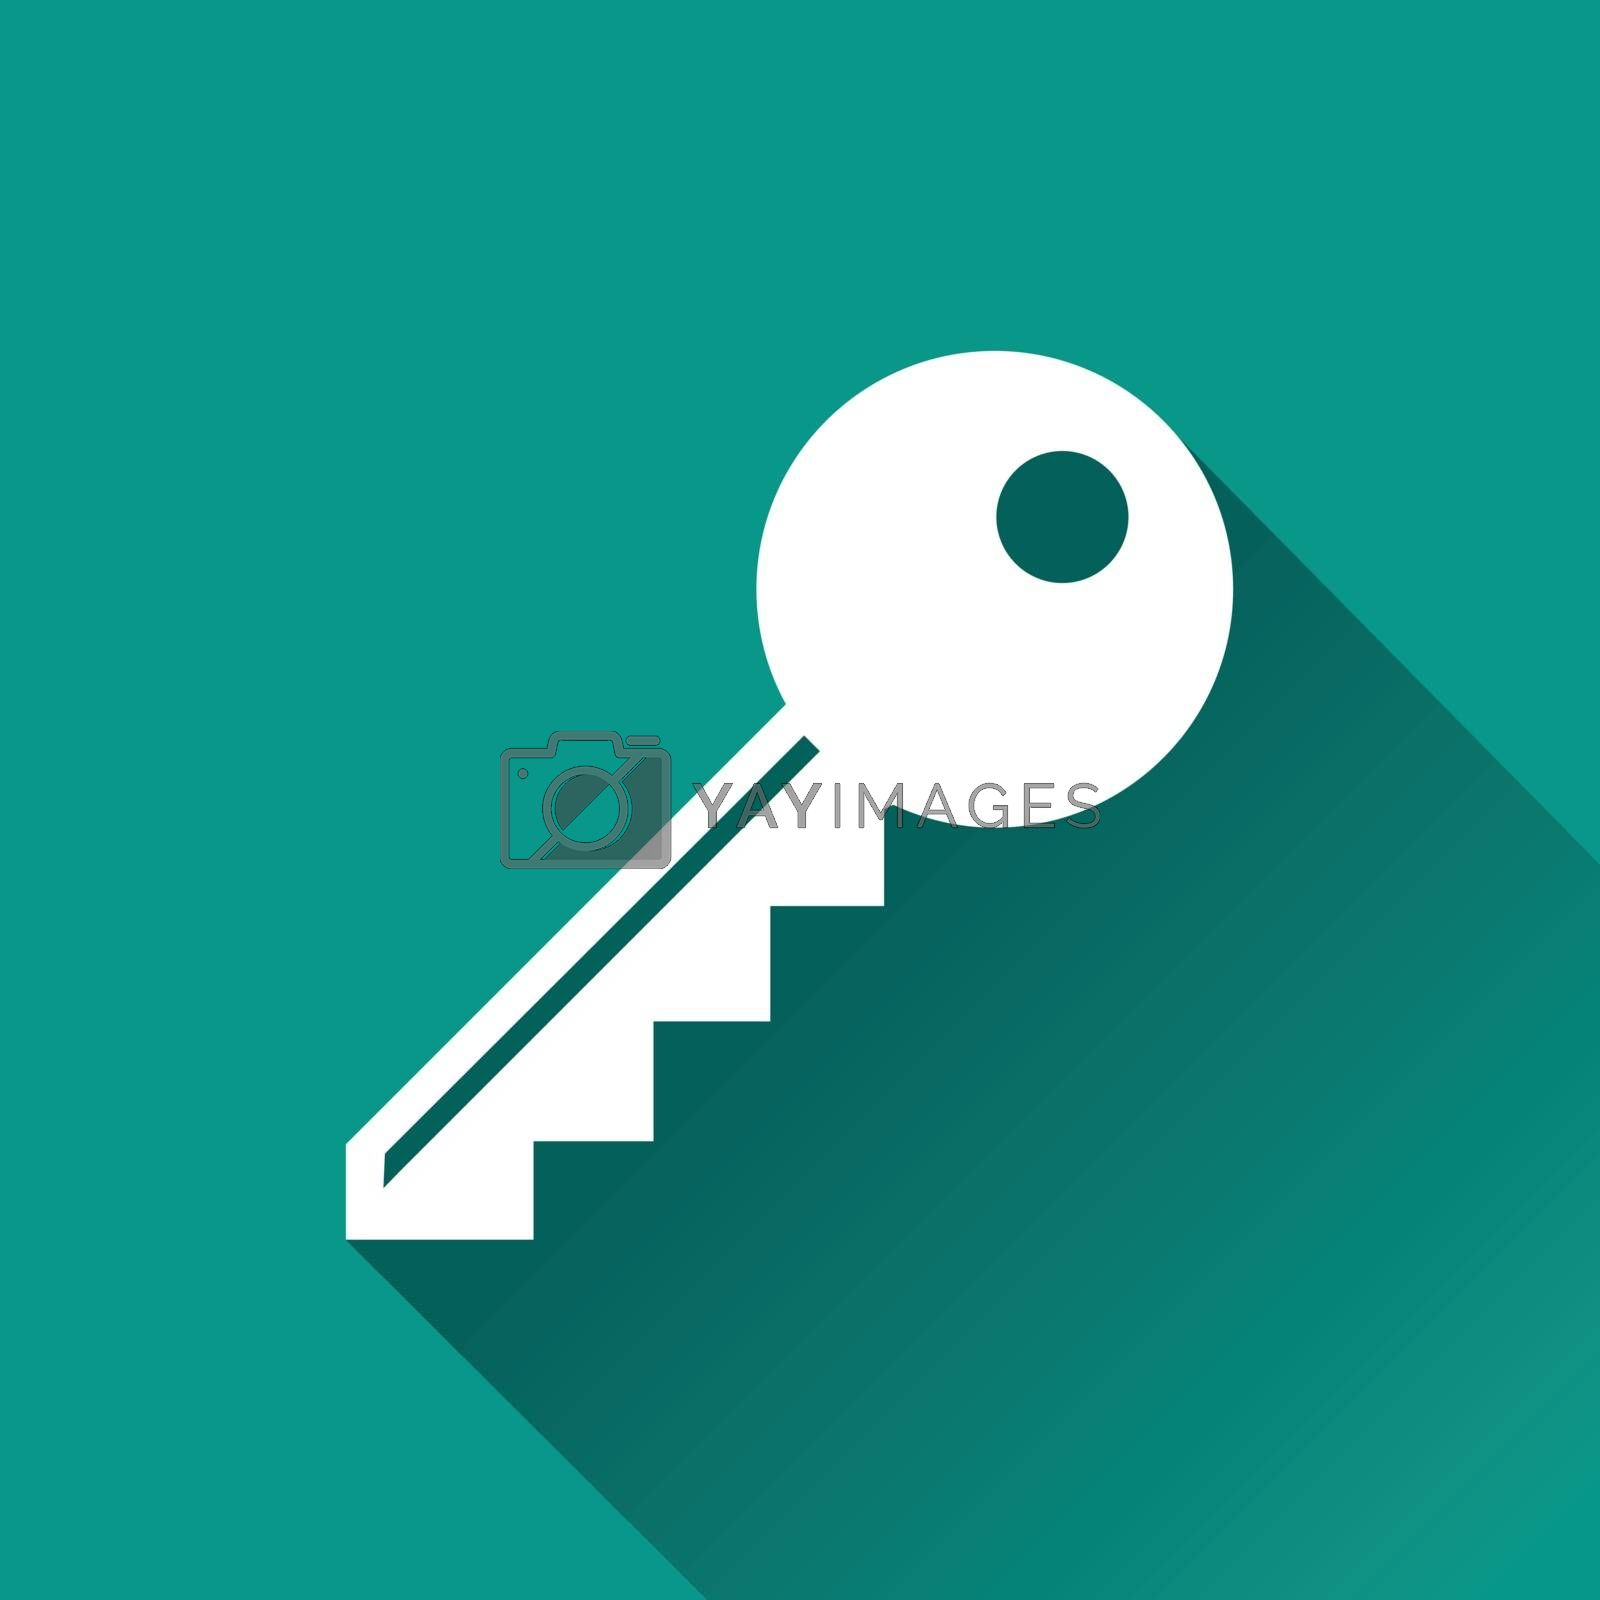 Royalty free image of key flat design icon by nickylarson974